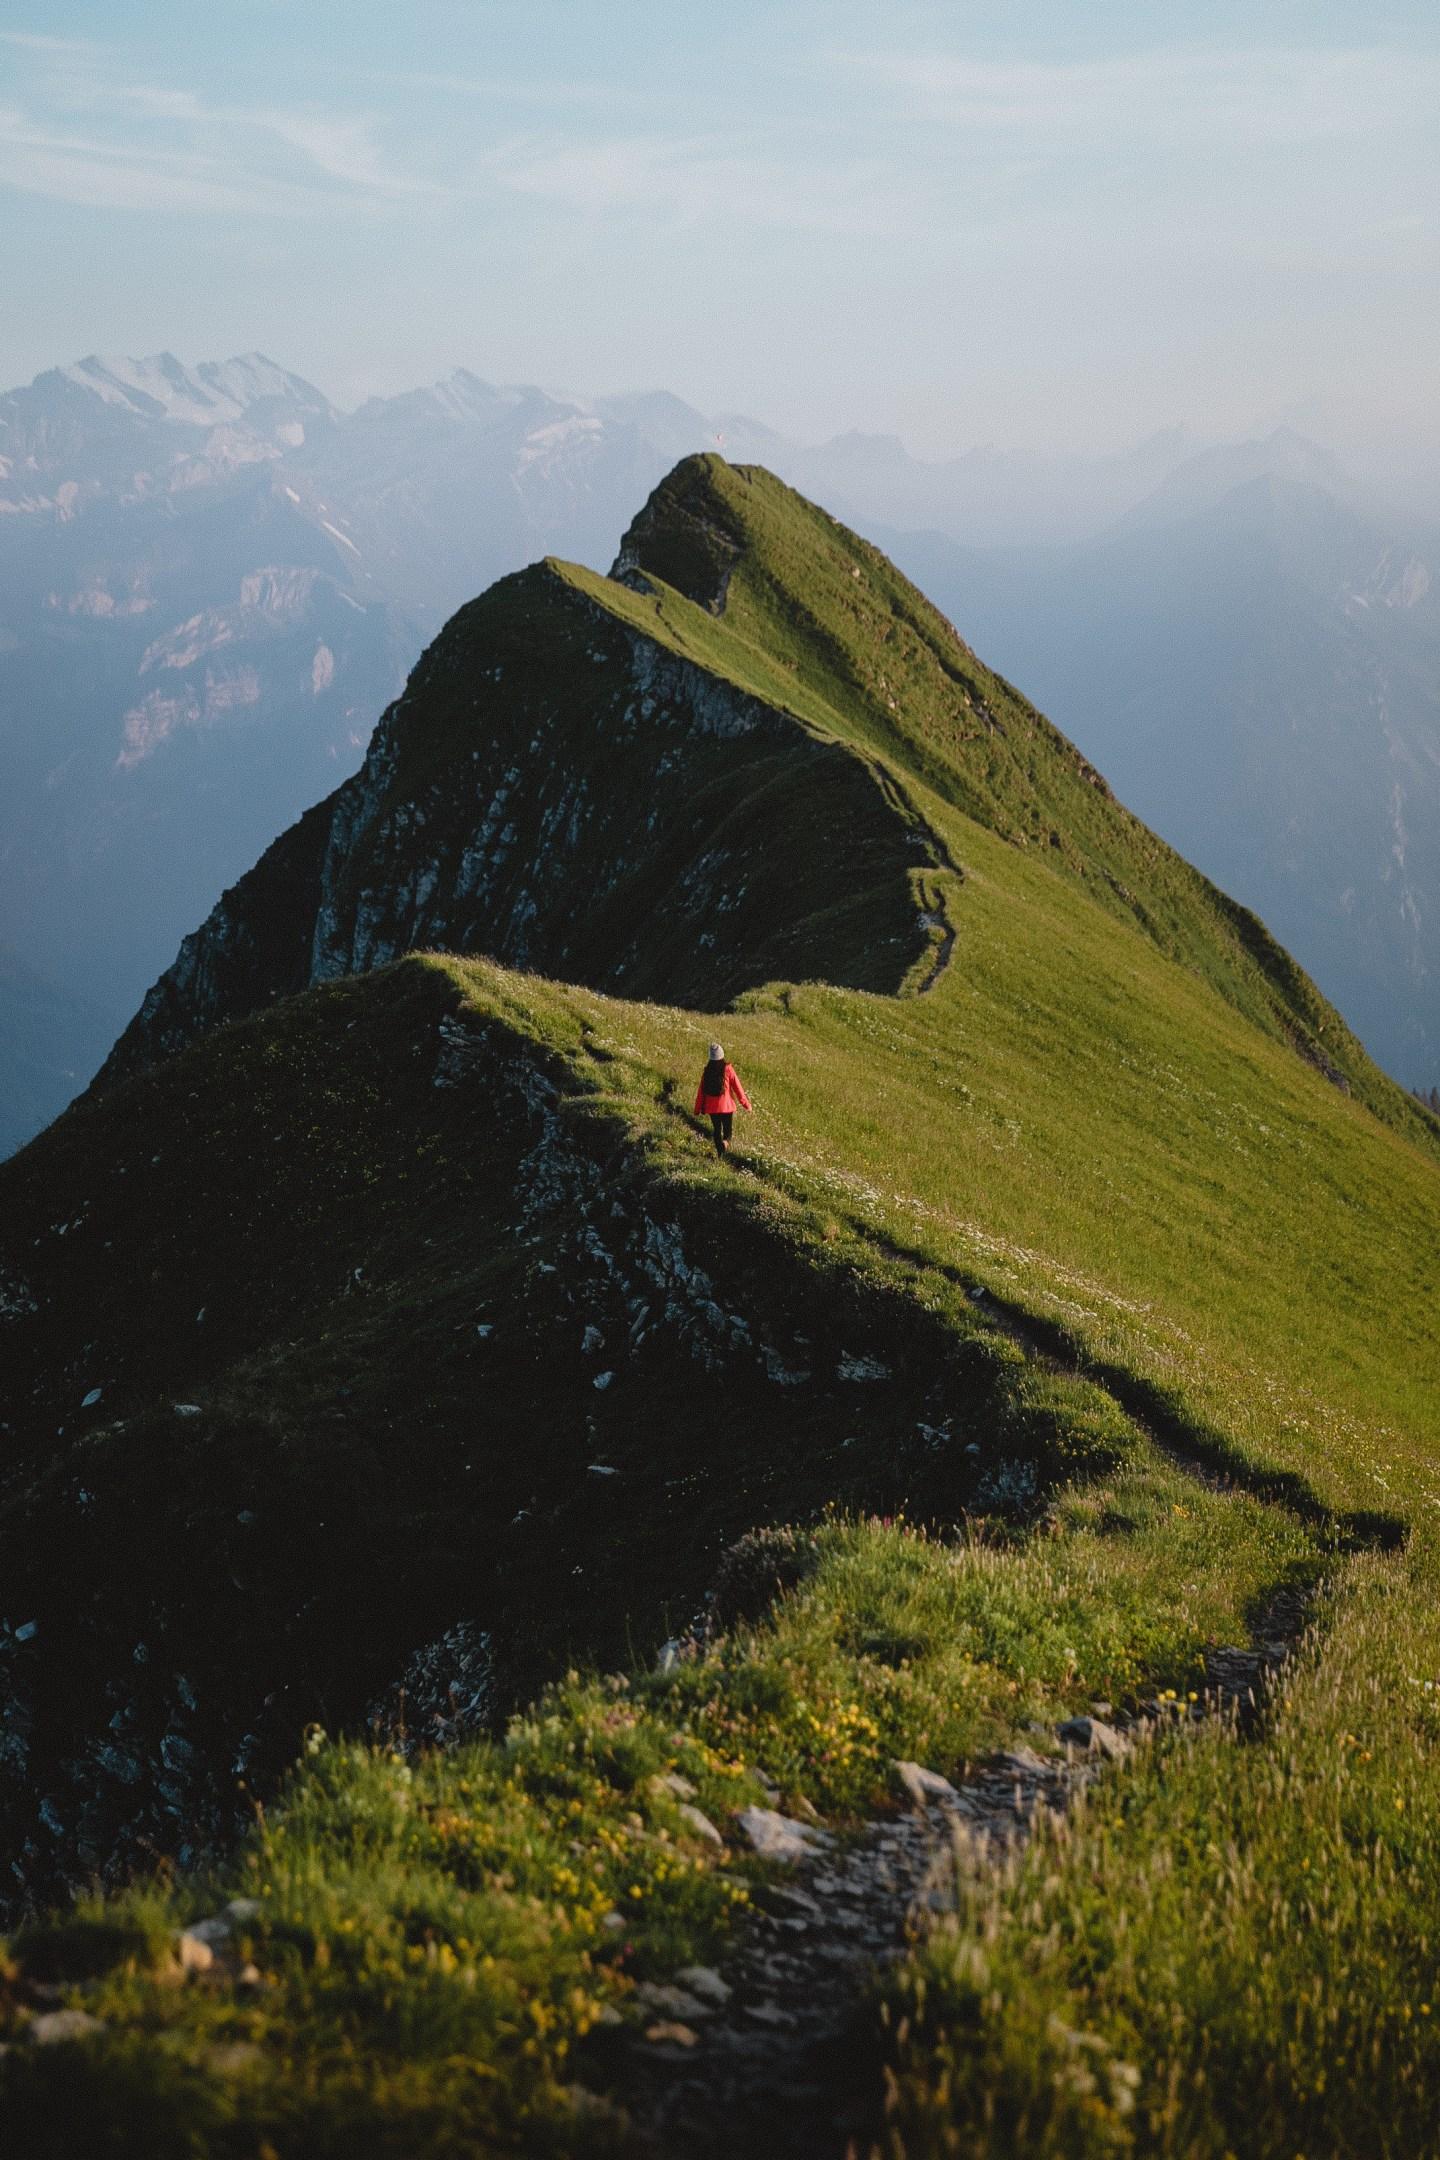 hiking in Switzerland grassy ridgeline